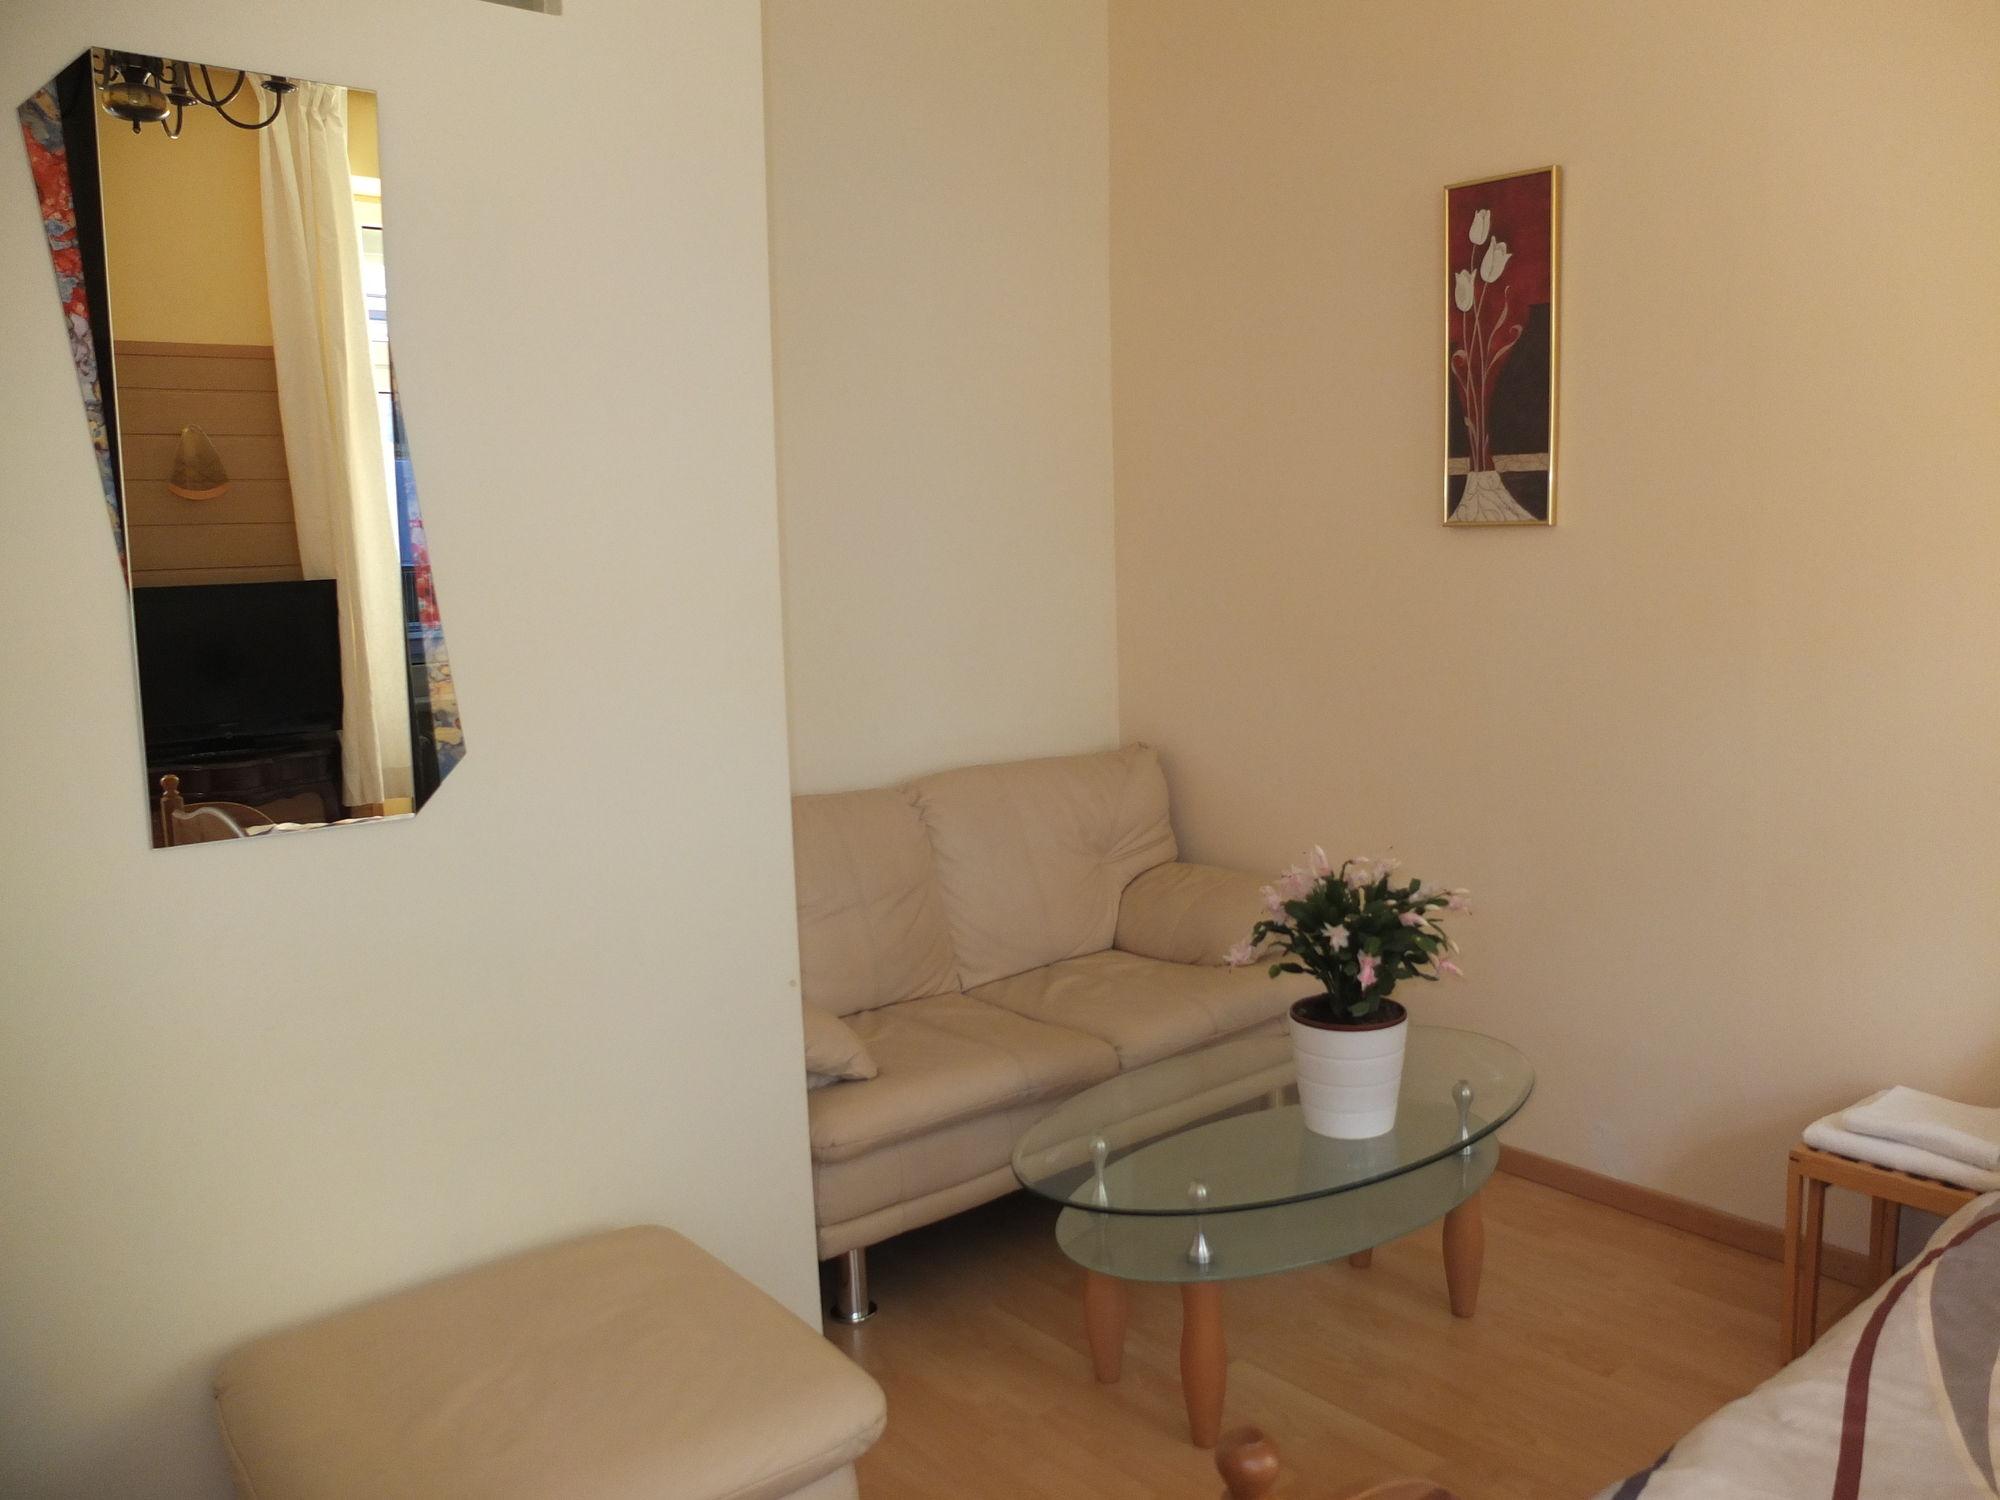 Leopoldauer Apartment (لئوپولداور آپارتمان)